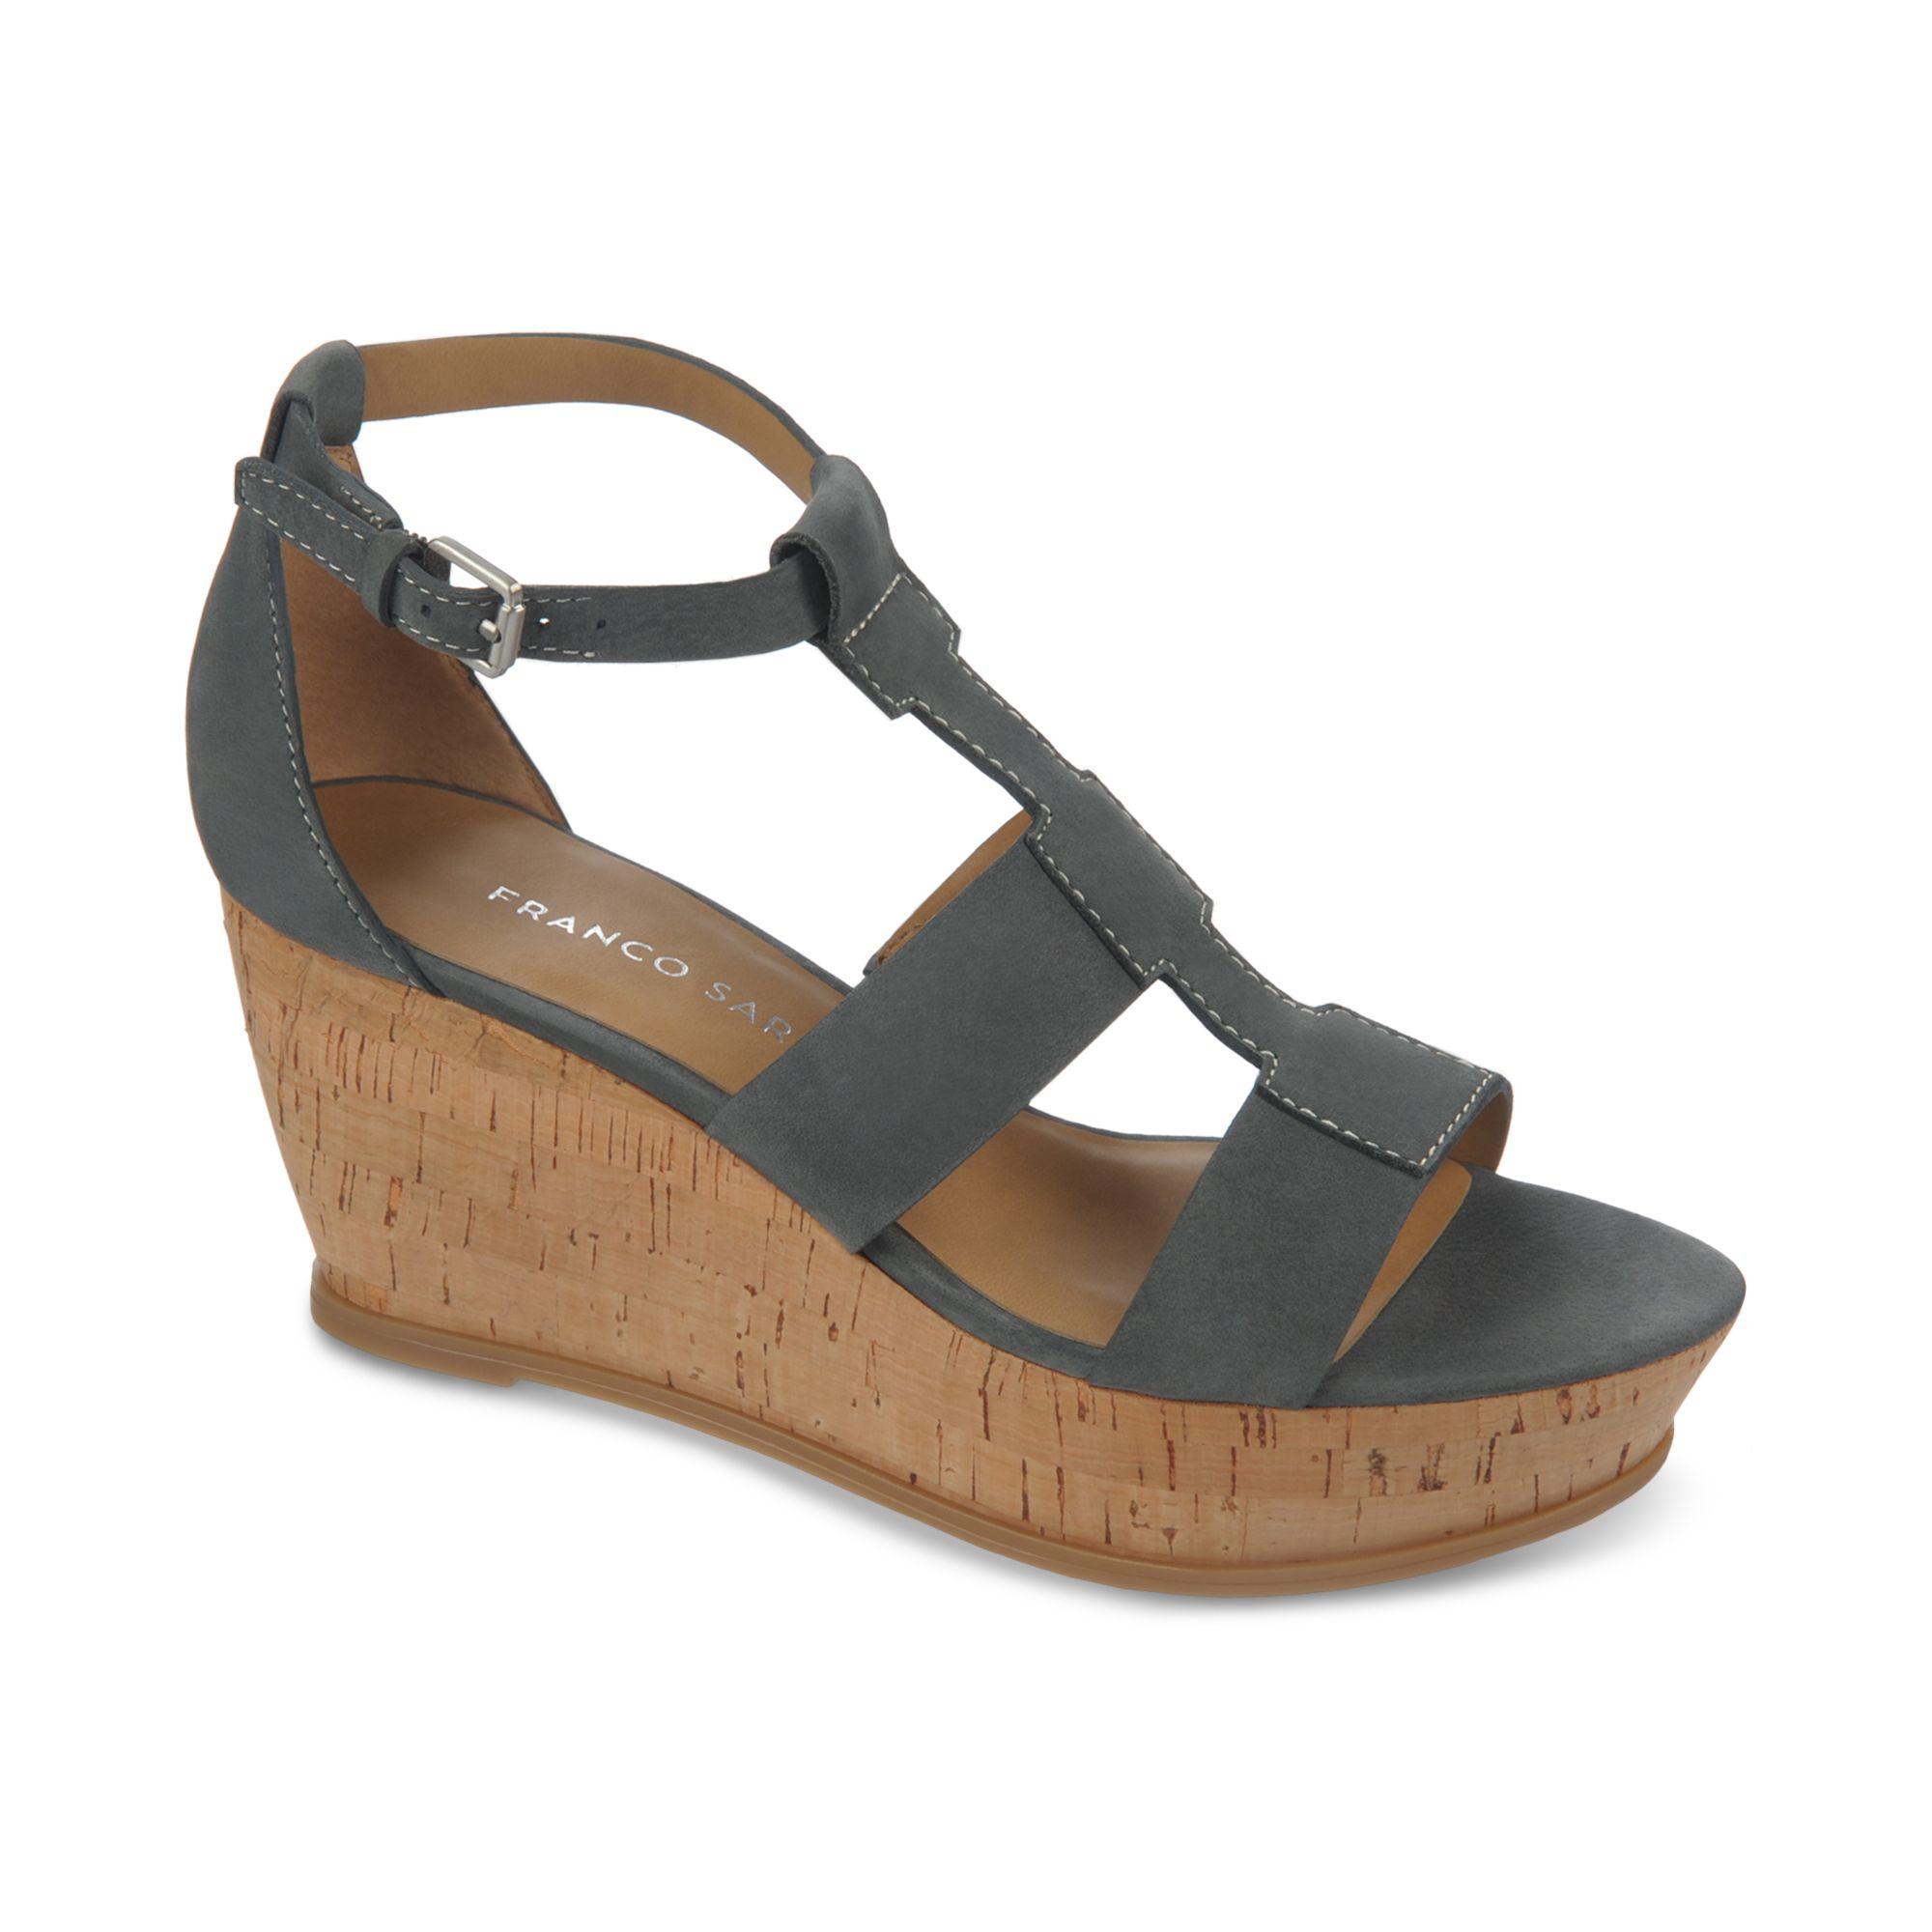 franco sarto falco cork wedge sandals in black lyst